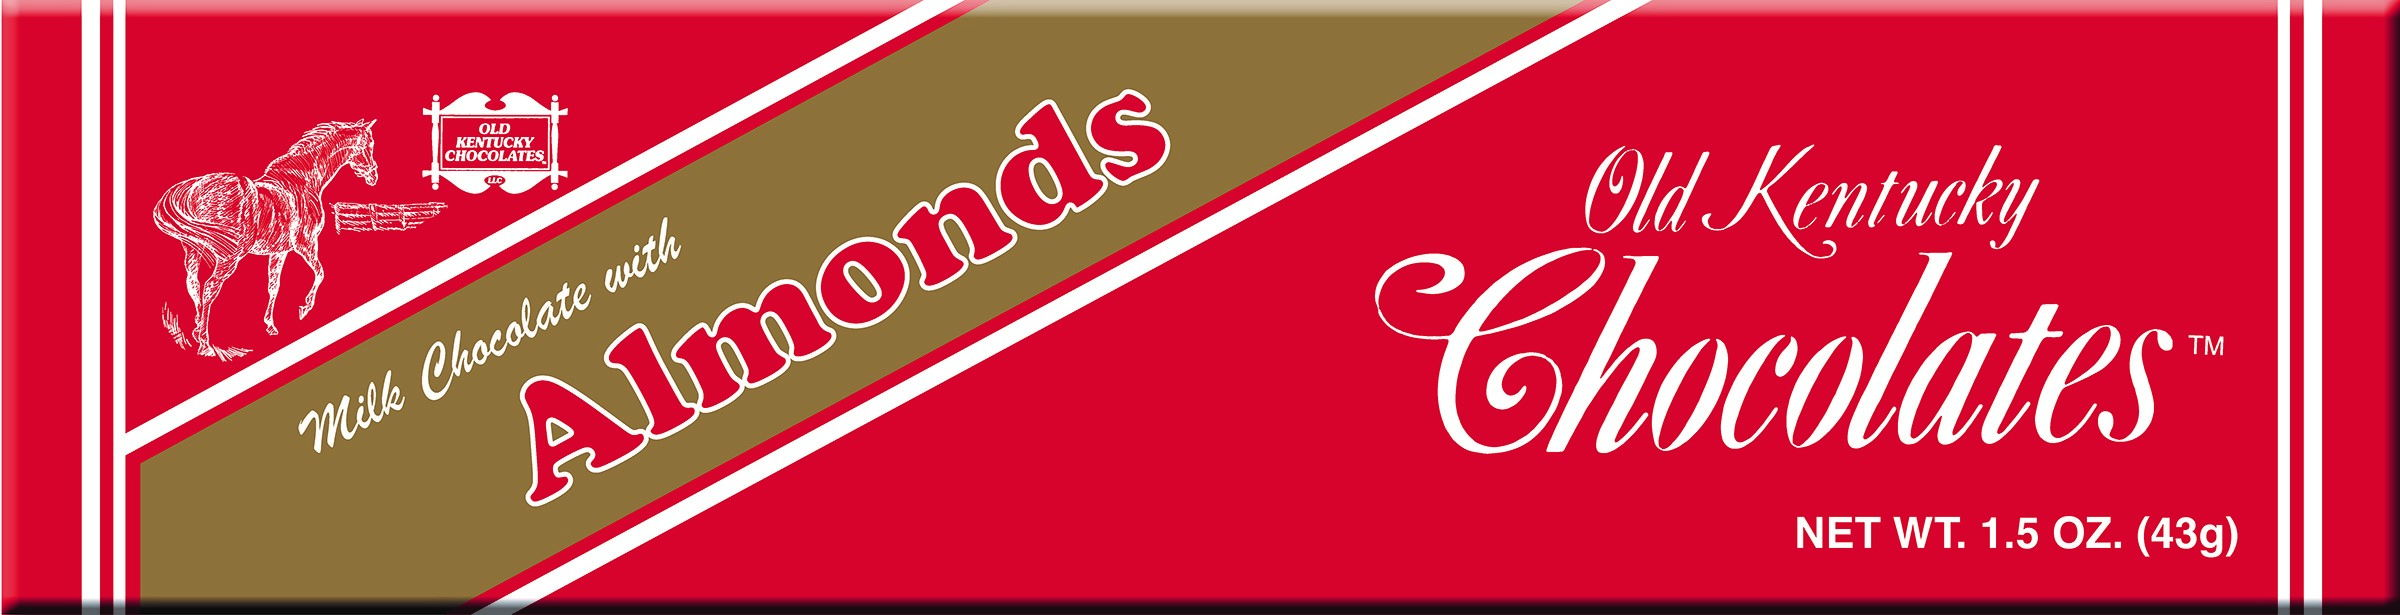 Old Kentucky Chocolates Almond Fundraising